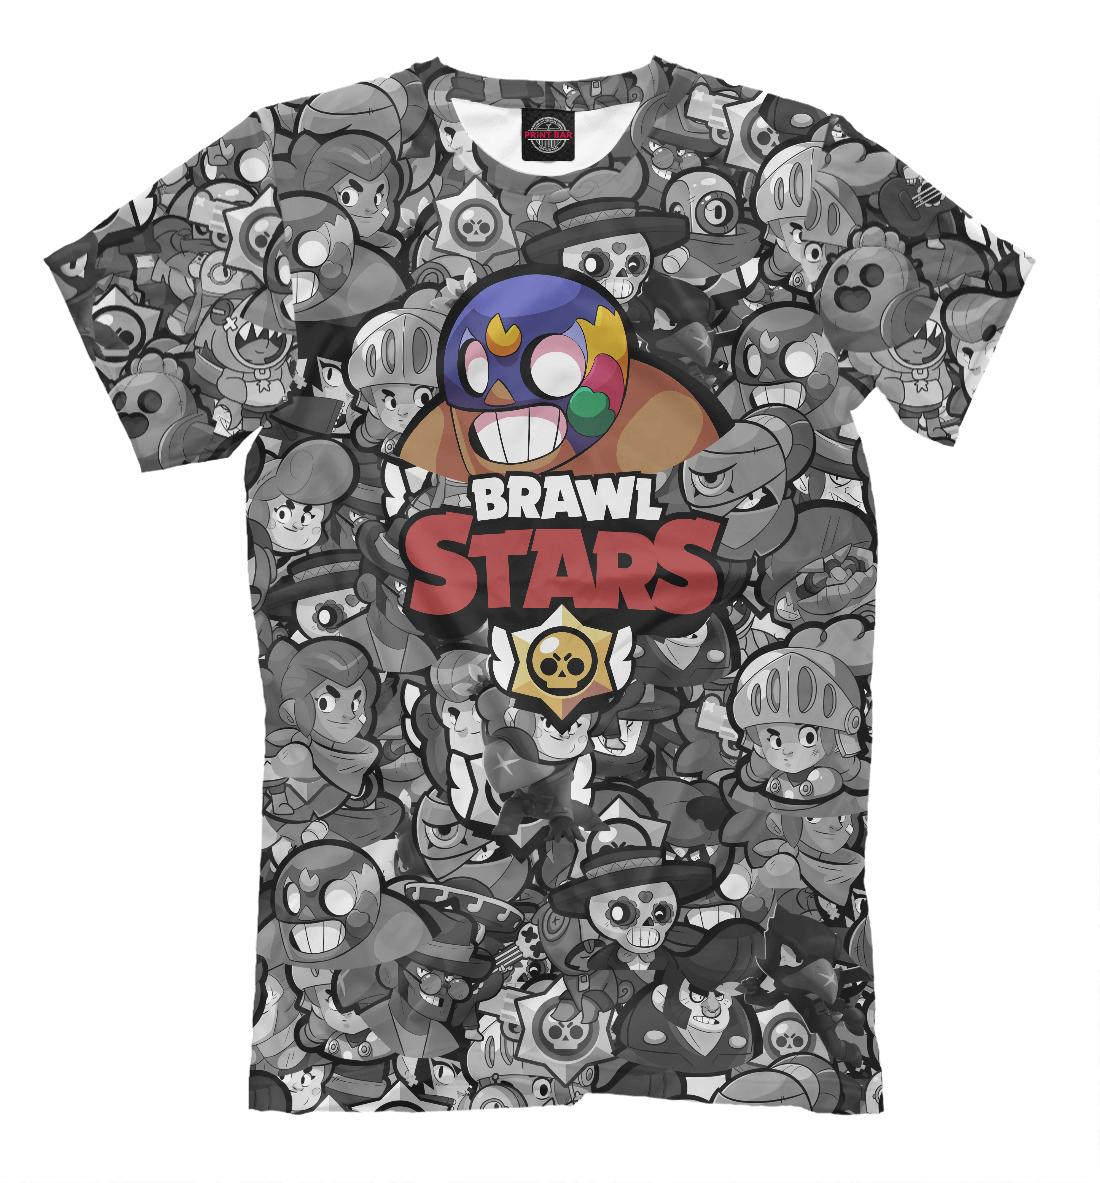 Фото - Brawl Stars El Primo brawl stars el primo